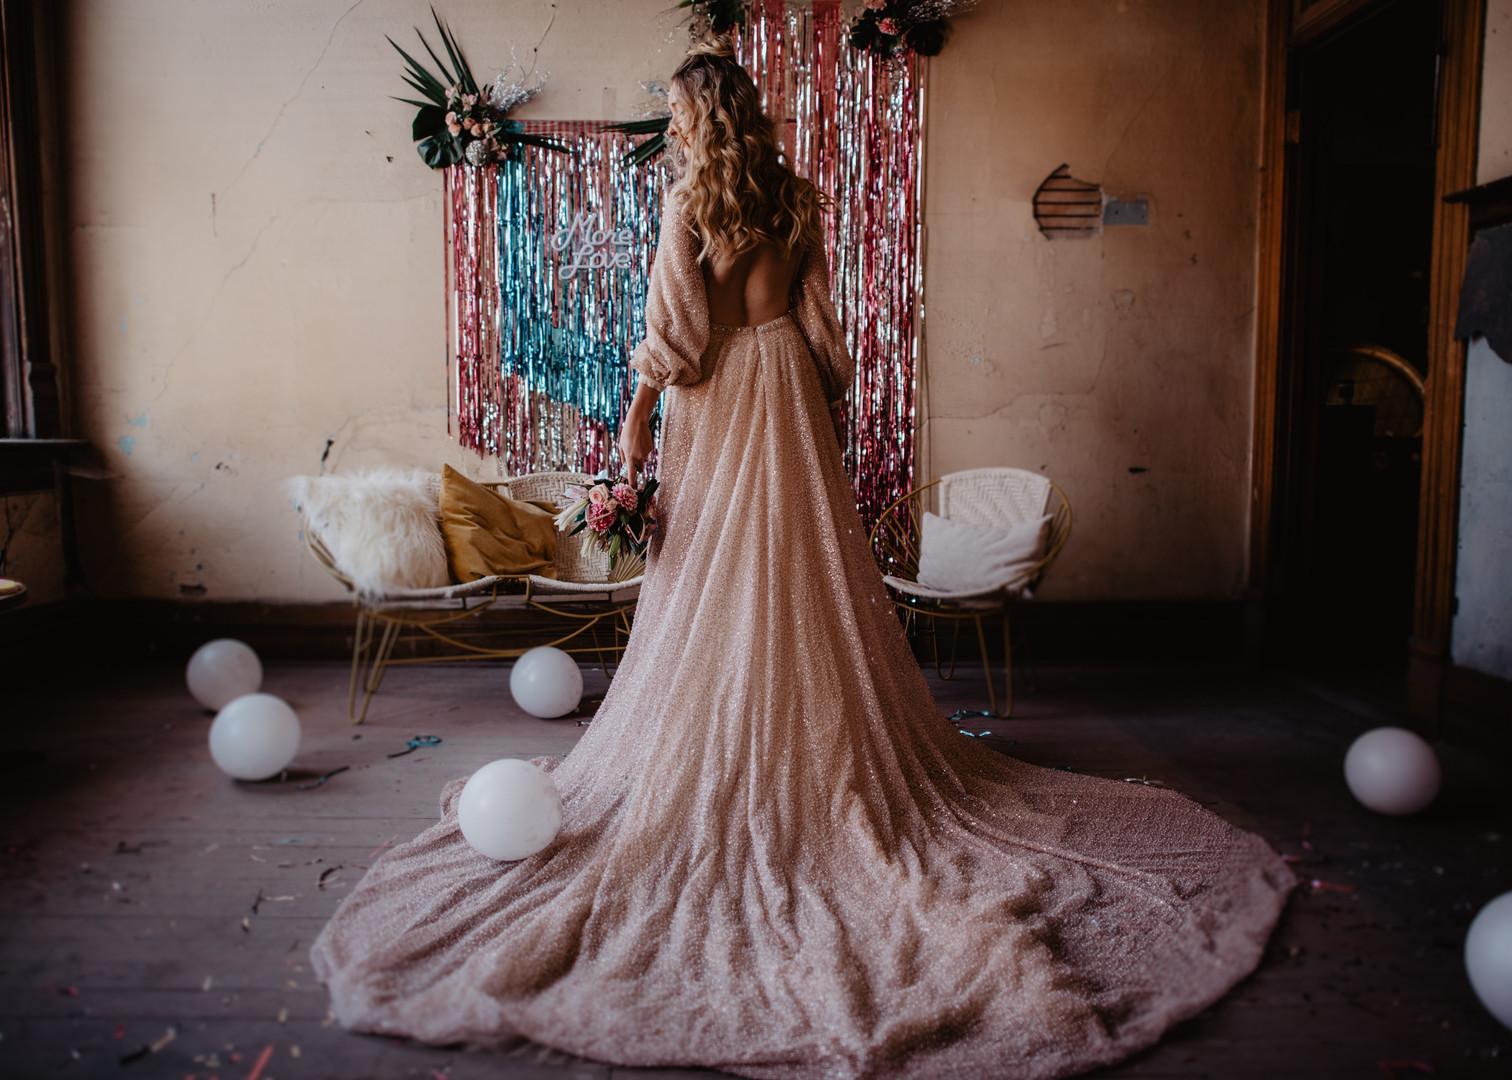 studio 54 inspired wedding_sneaks-22.jpg